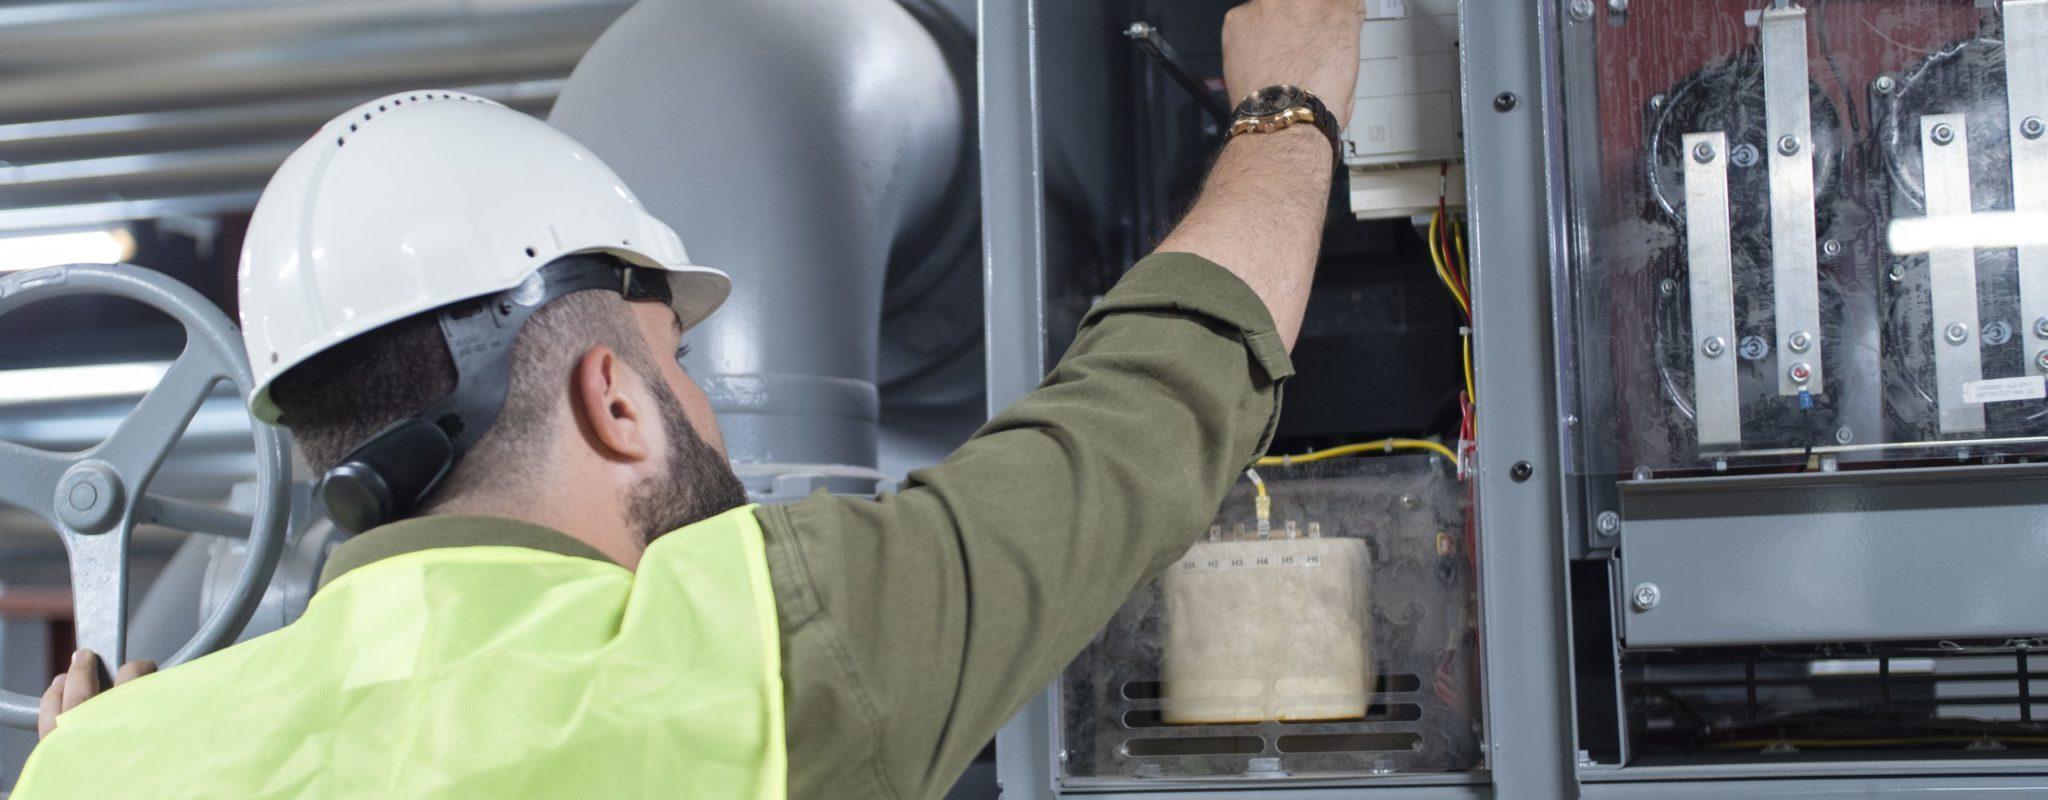 Engineer Checking The Panel